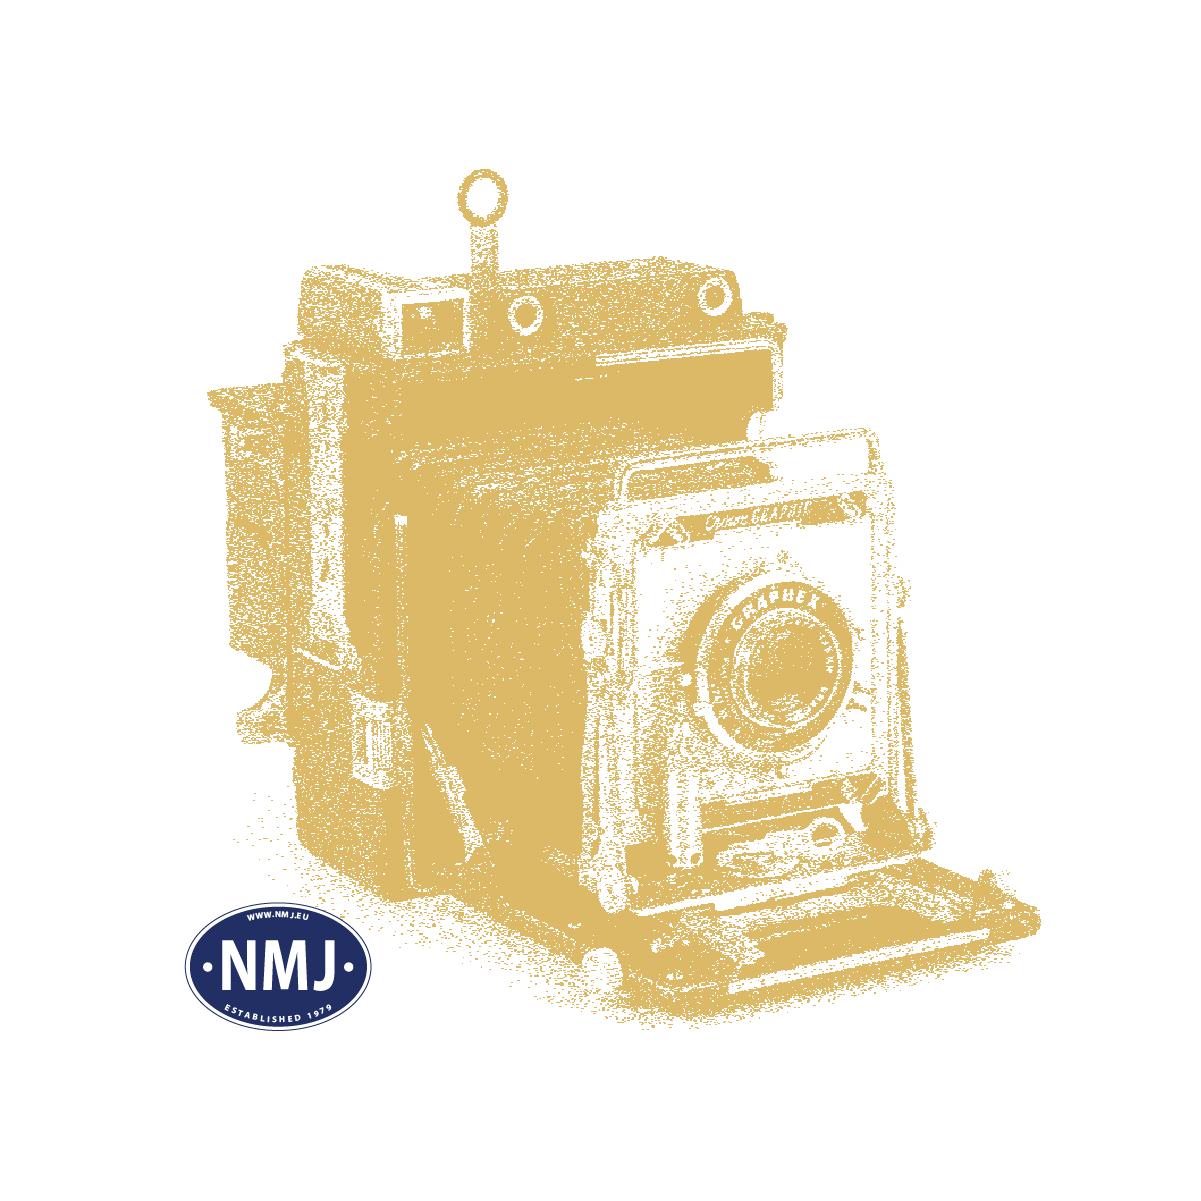 FAL172105 - Bruntippet Pensel, 1